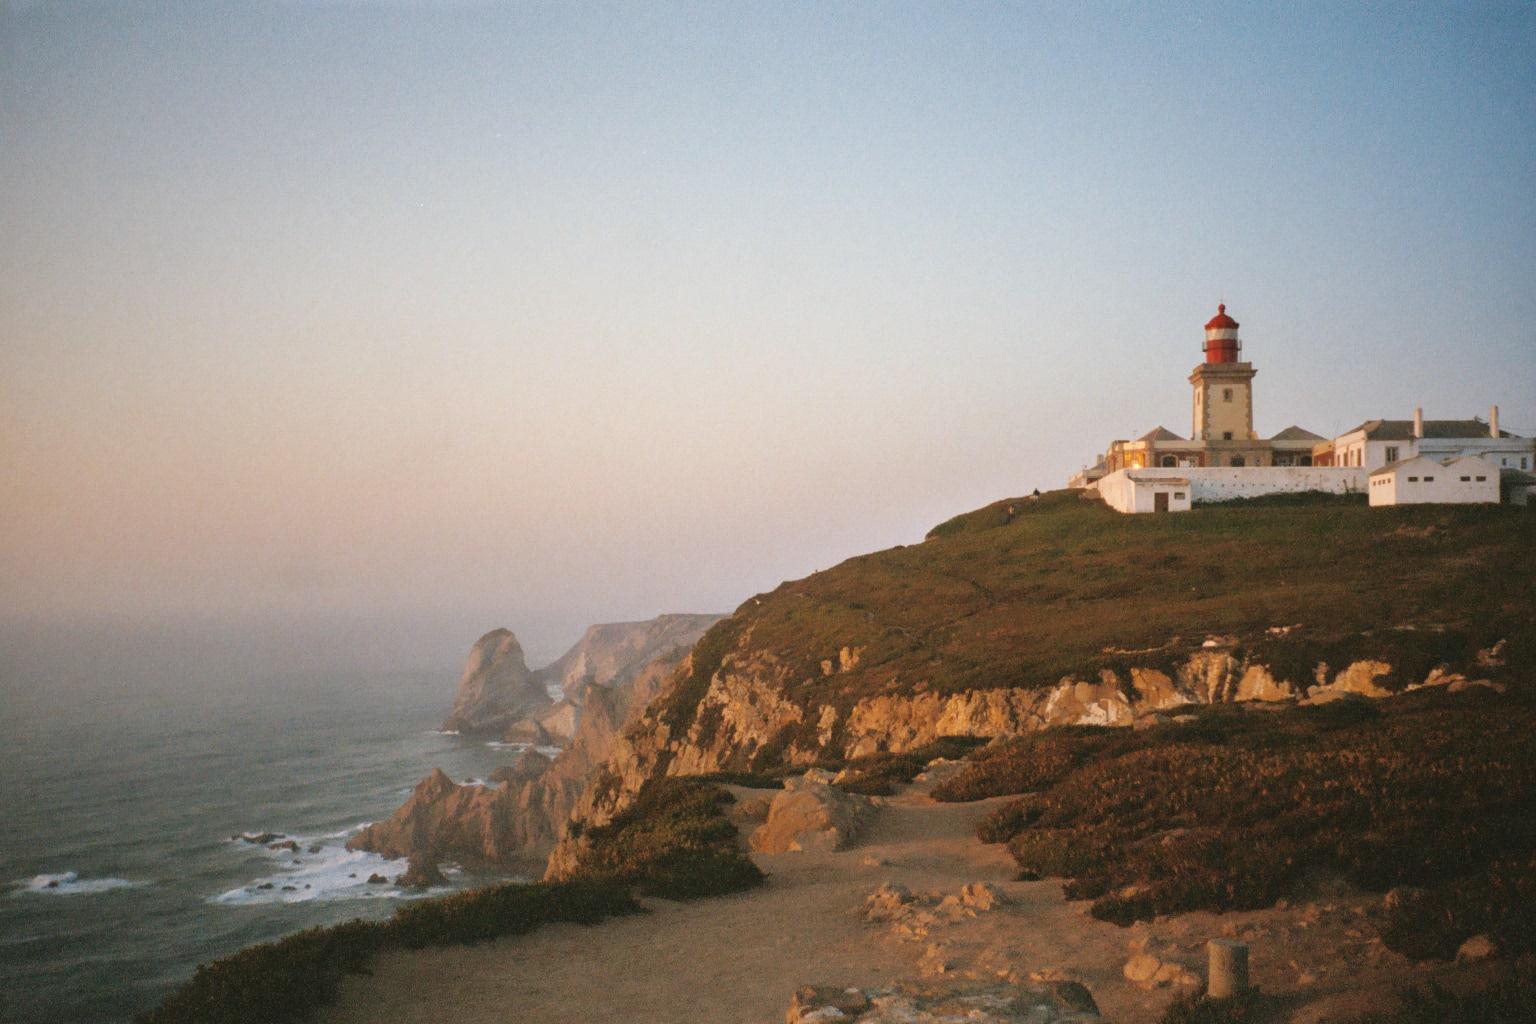 羅卡角(Cabo da Roca)